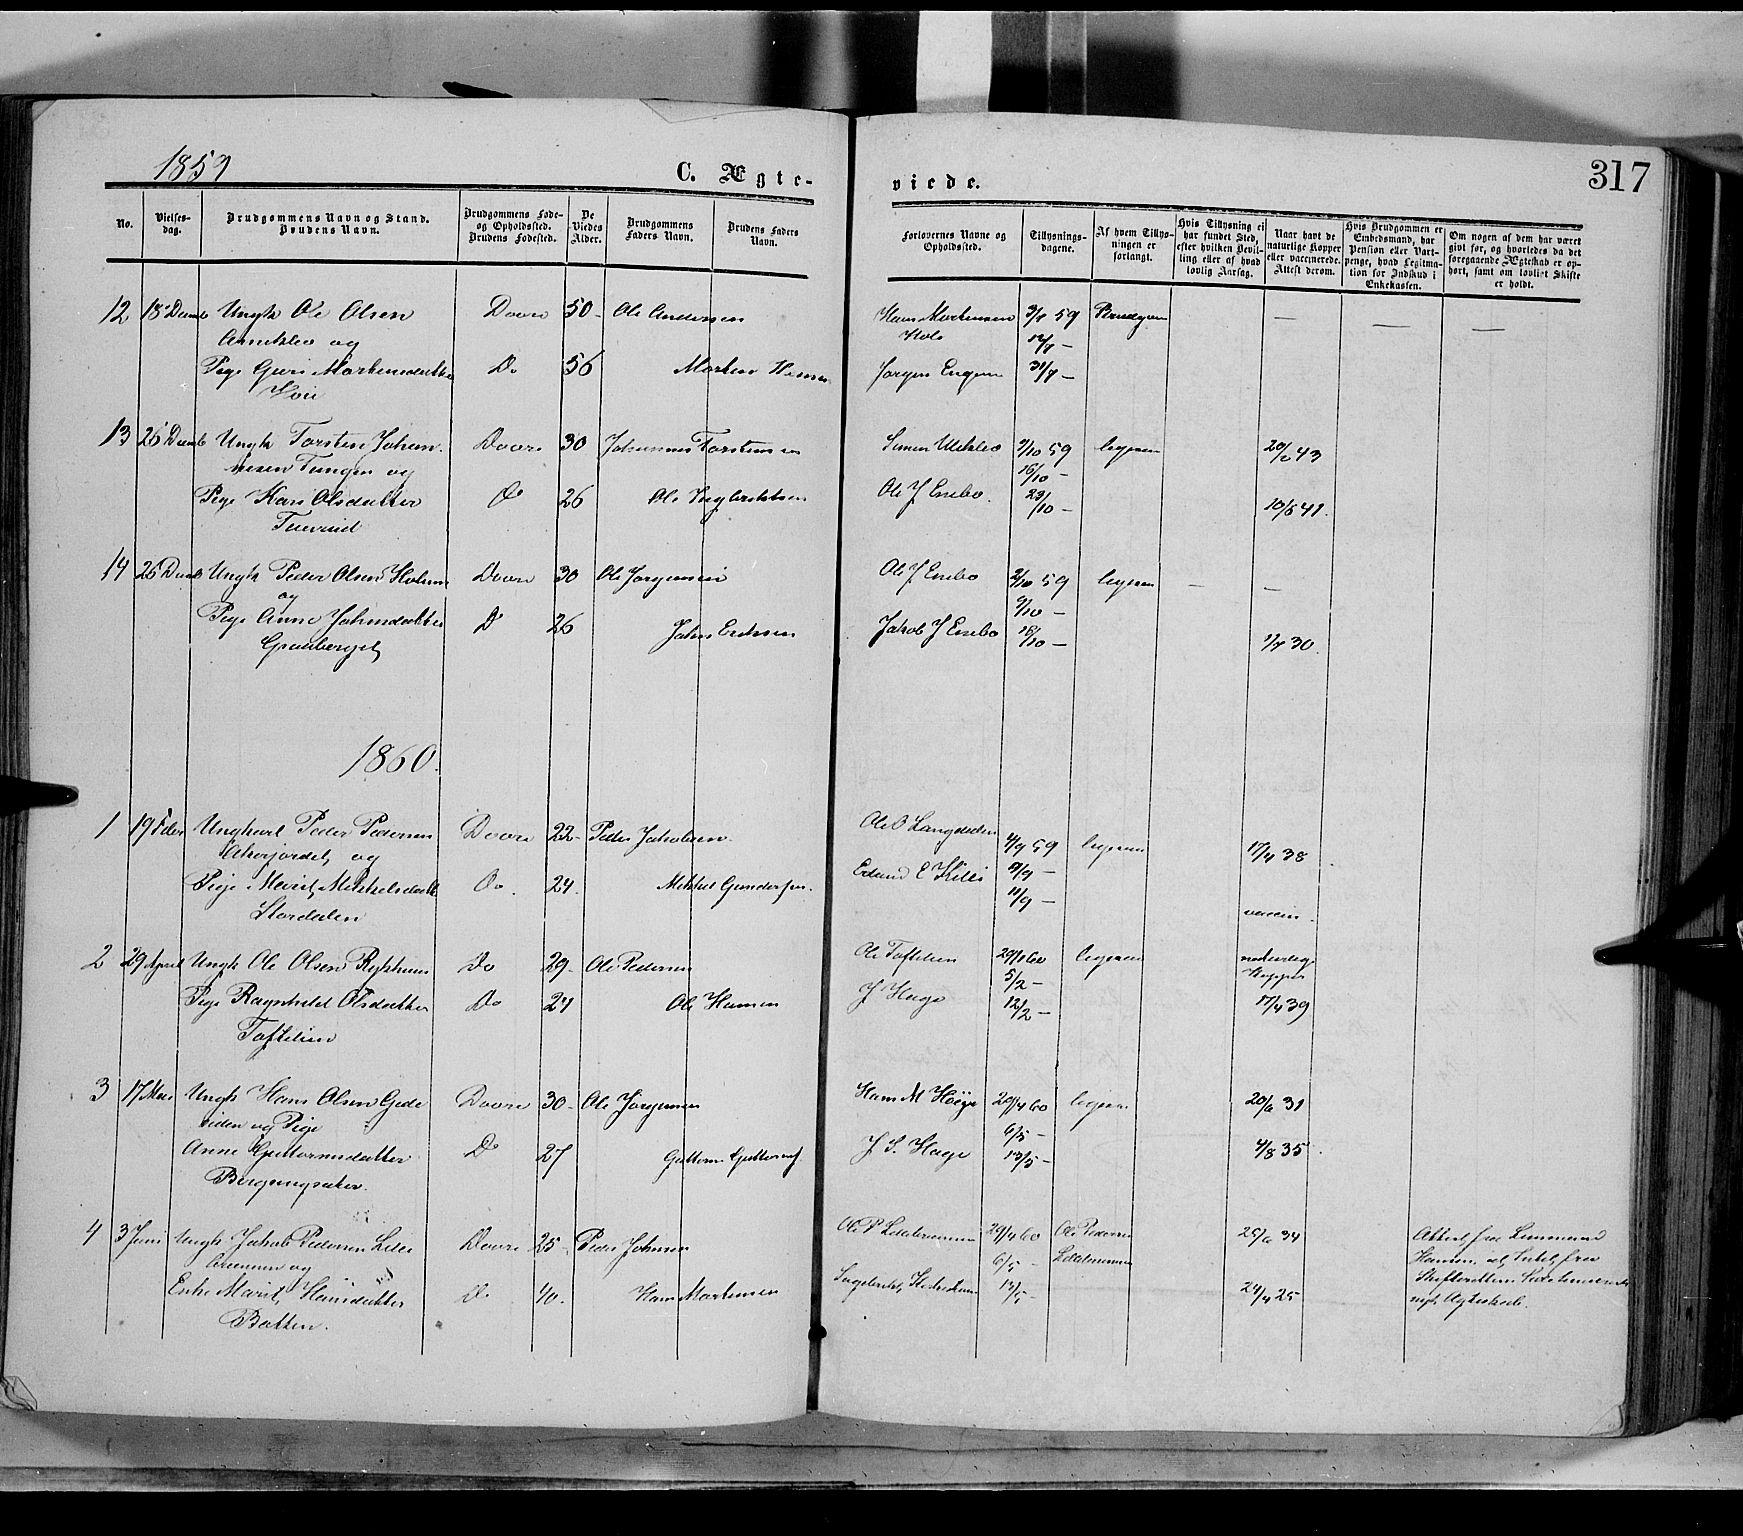 SAH, Dovre prestekontor, Ministerialbok nr. 1, 1854-1878, s. 317